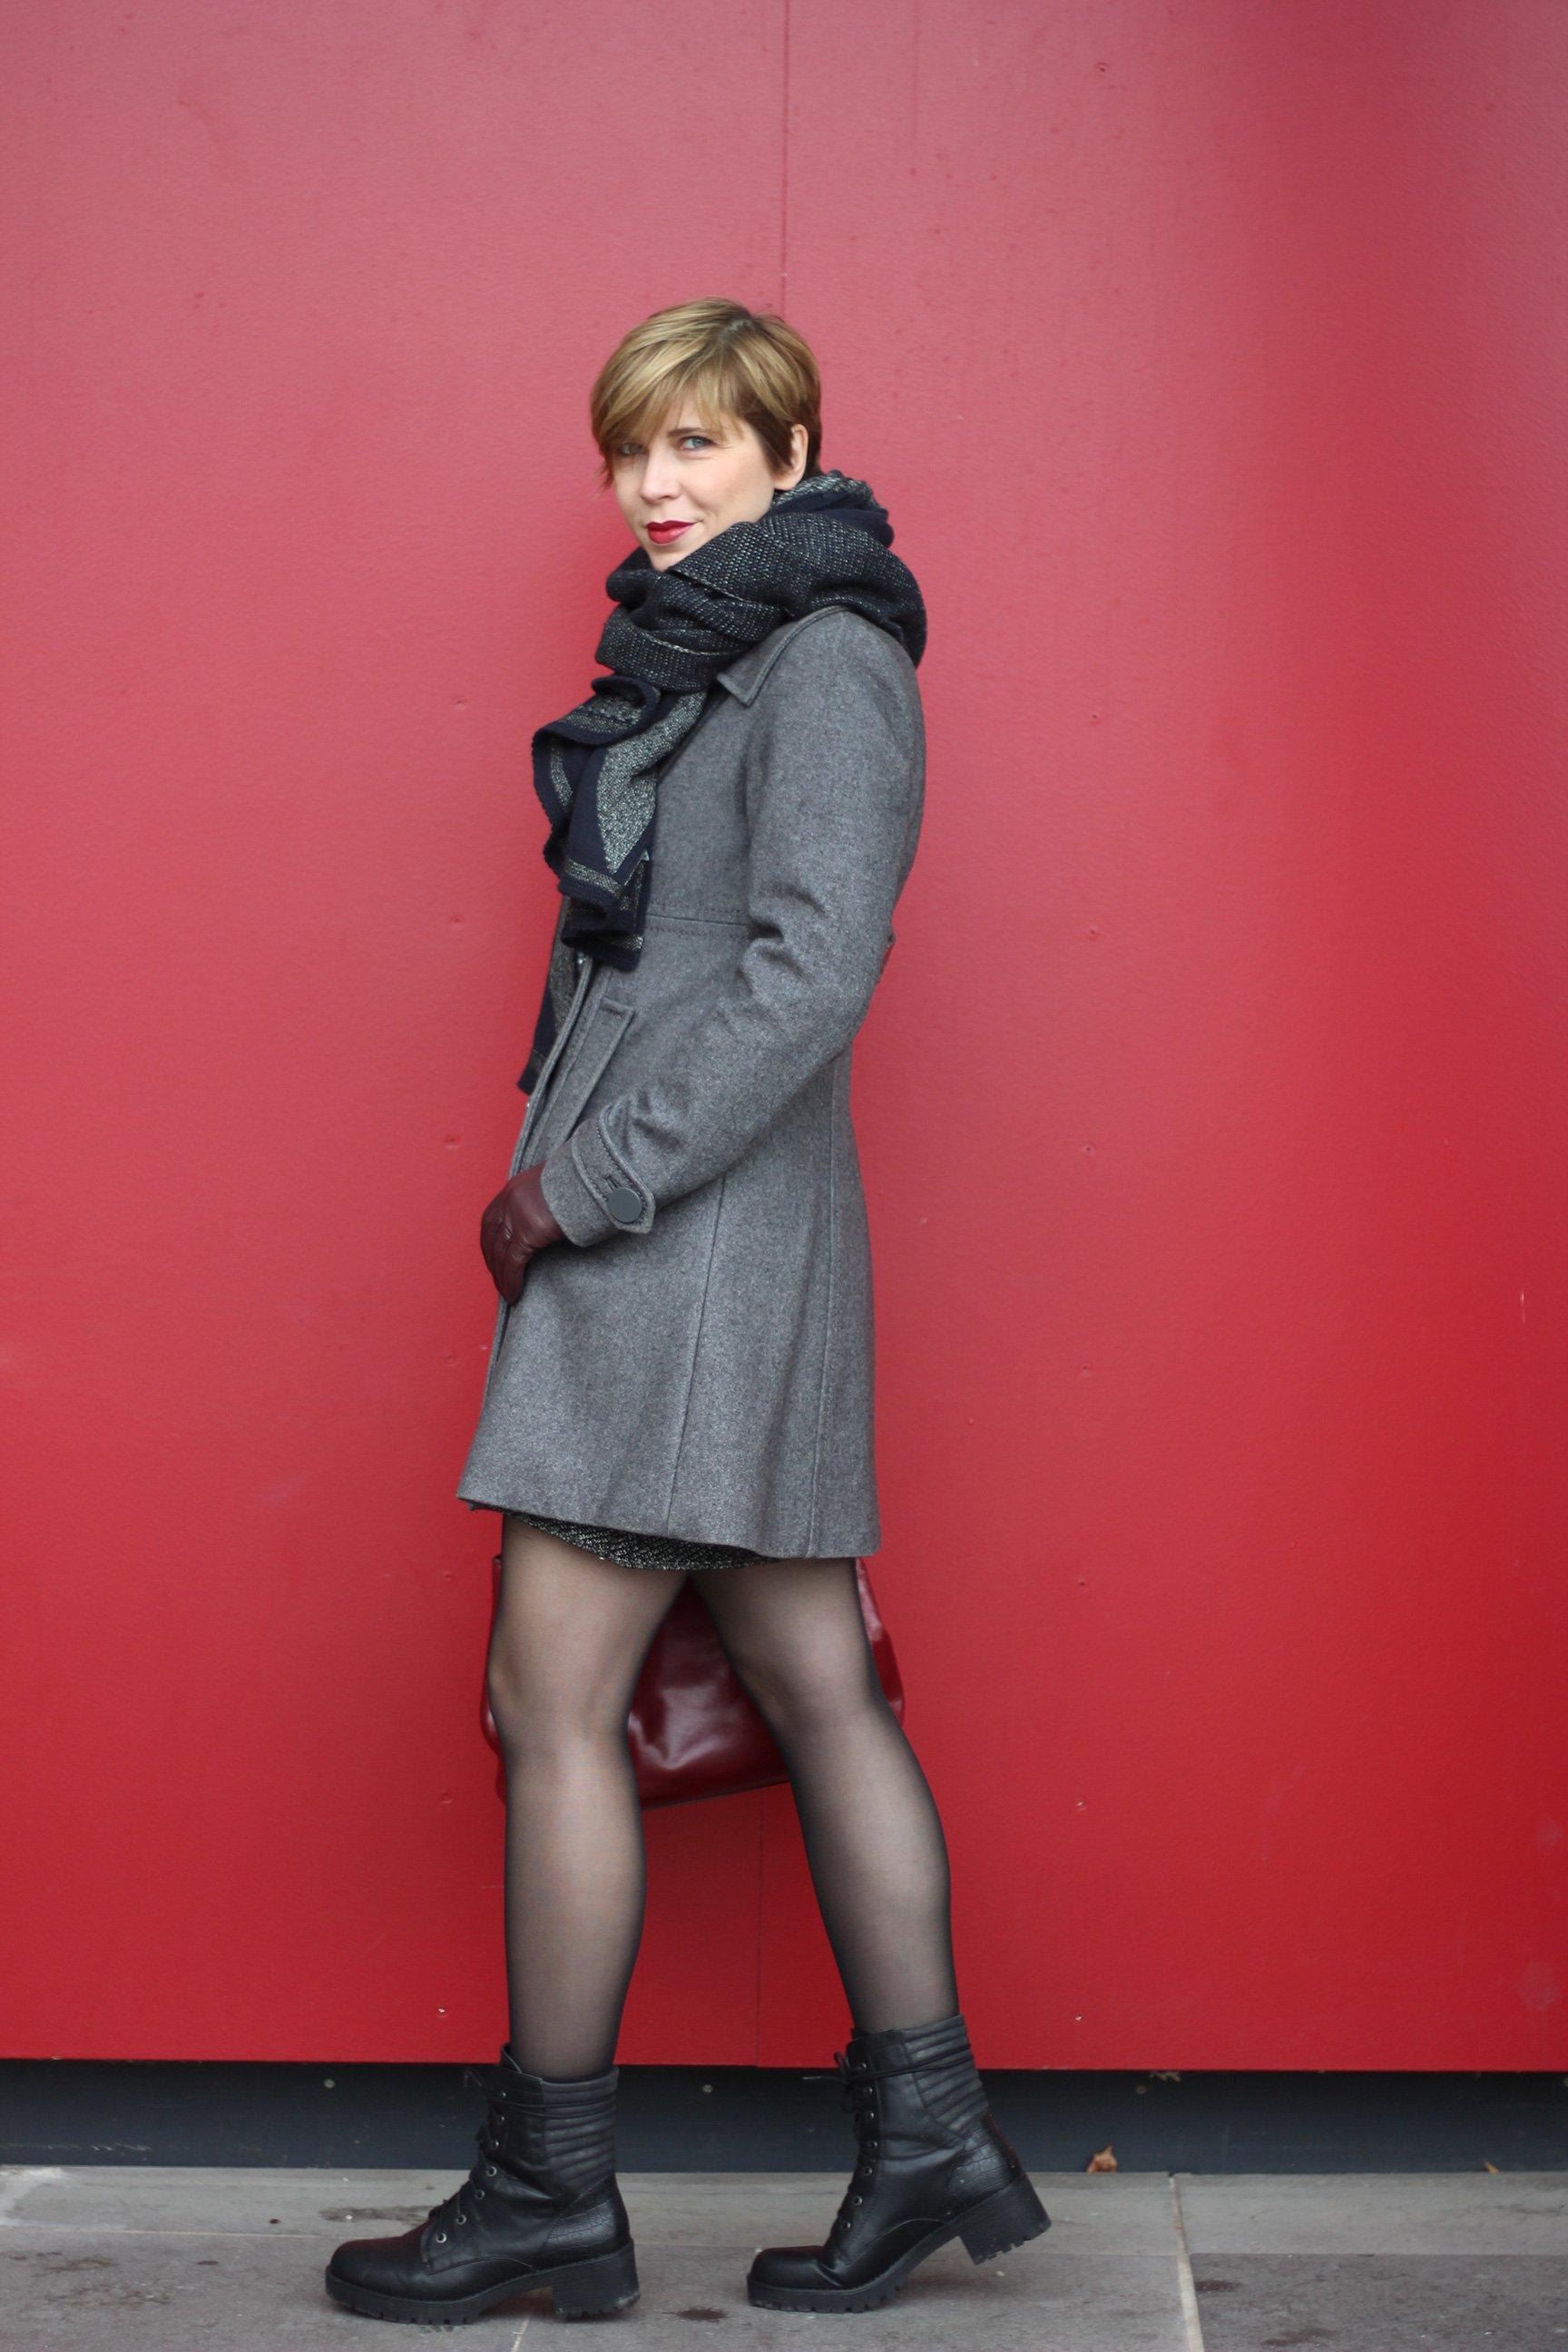 Rock - Woche: Mantel mit Schal - vor roter Wand - burgunderrote Michael Kors Tasche